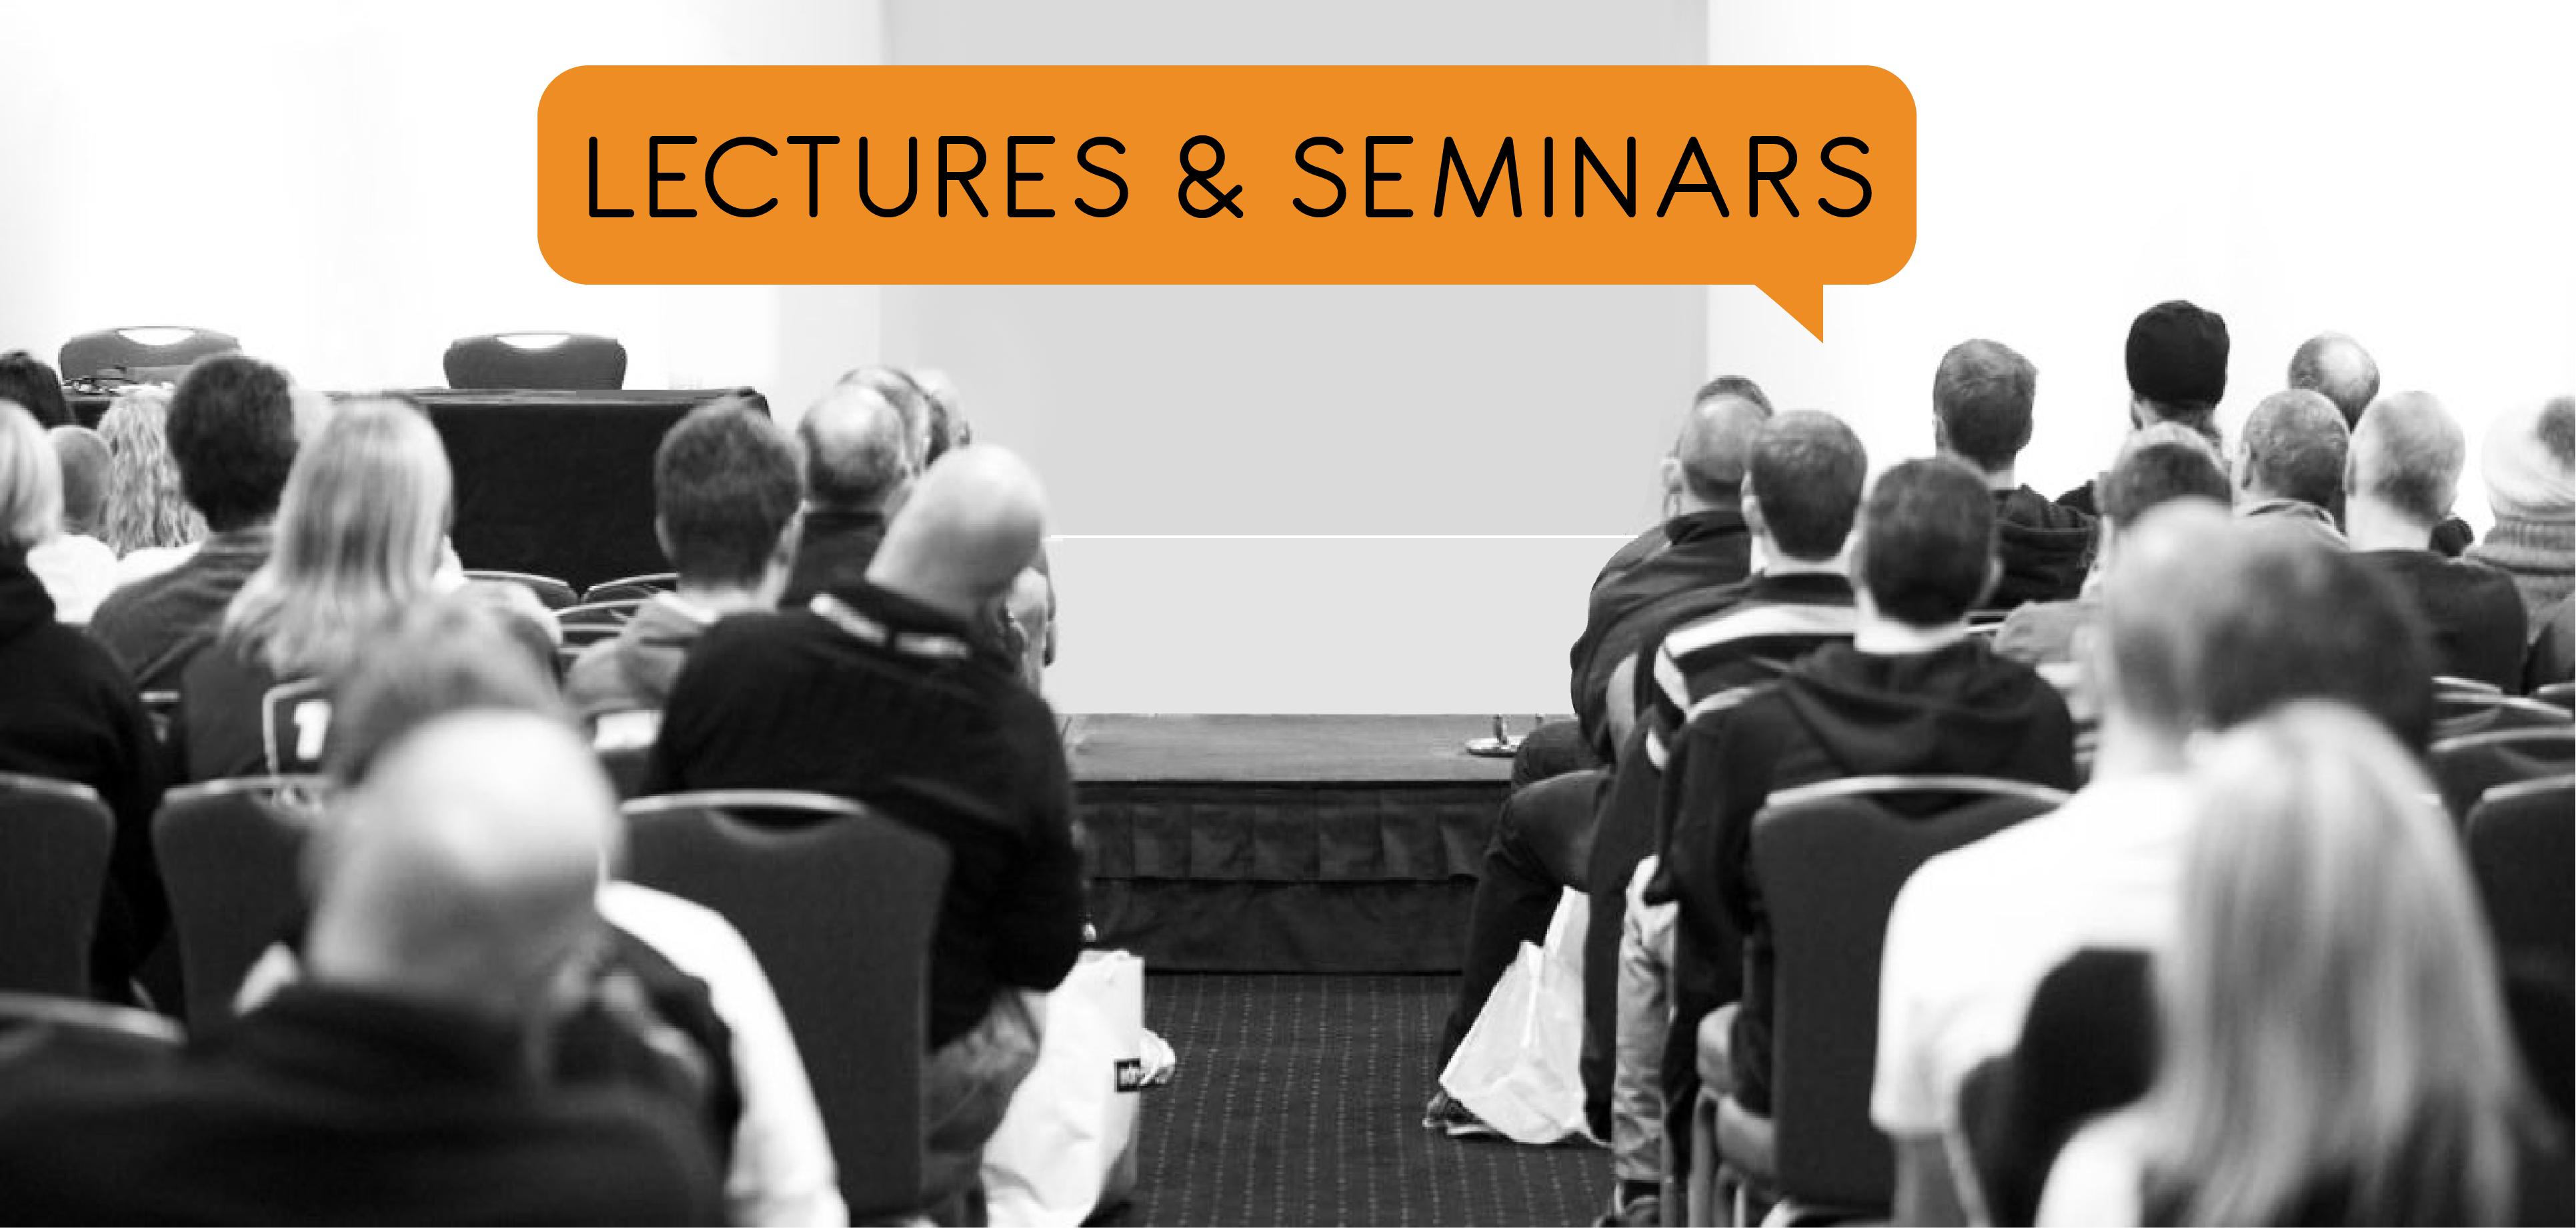 Lectures & Seminars